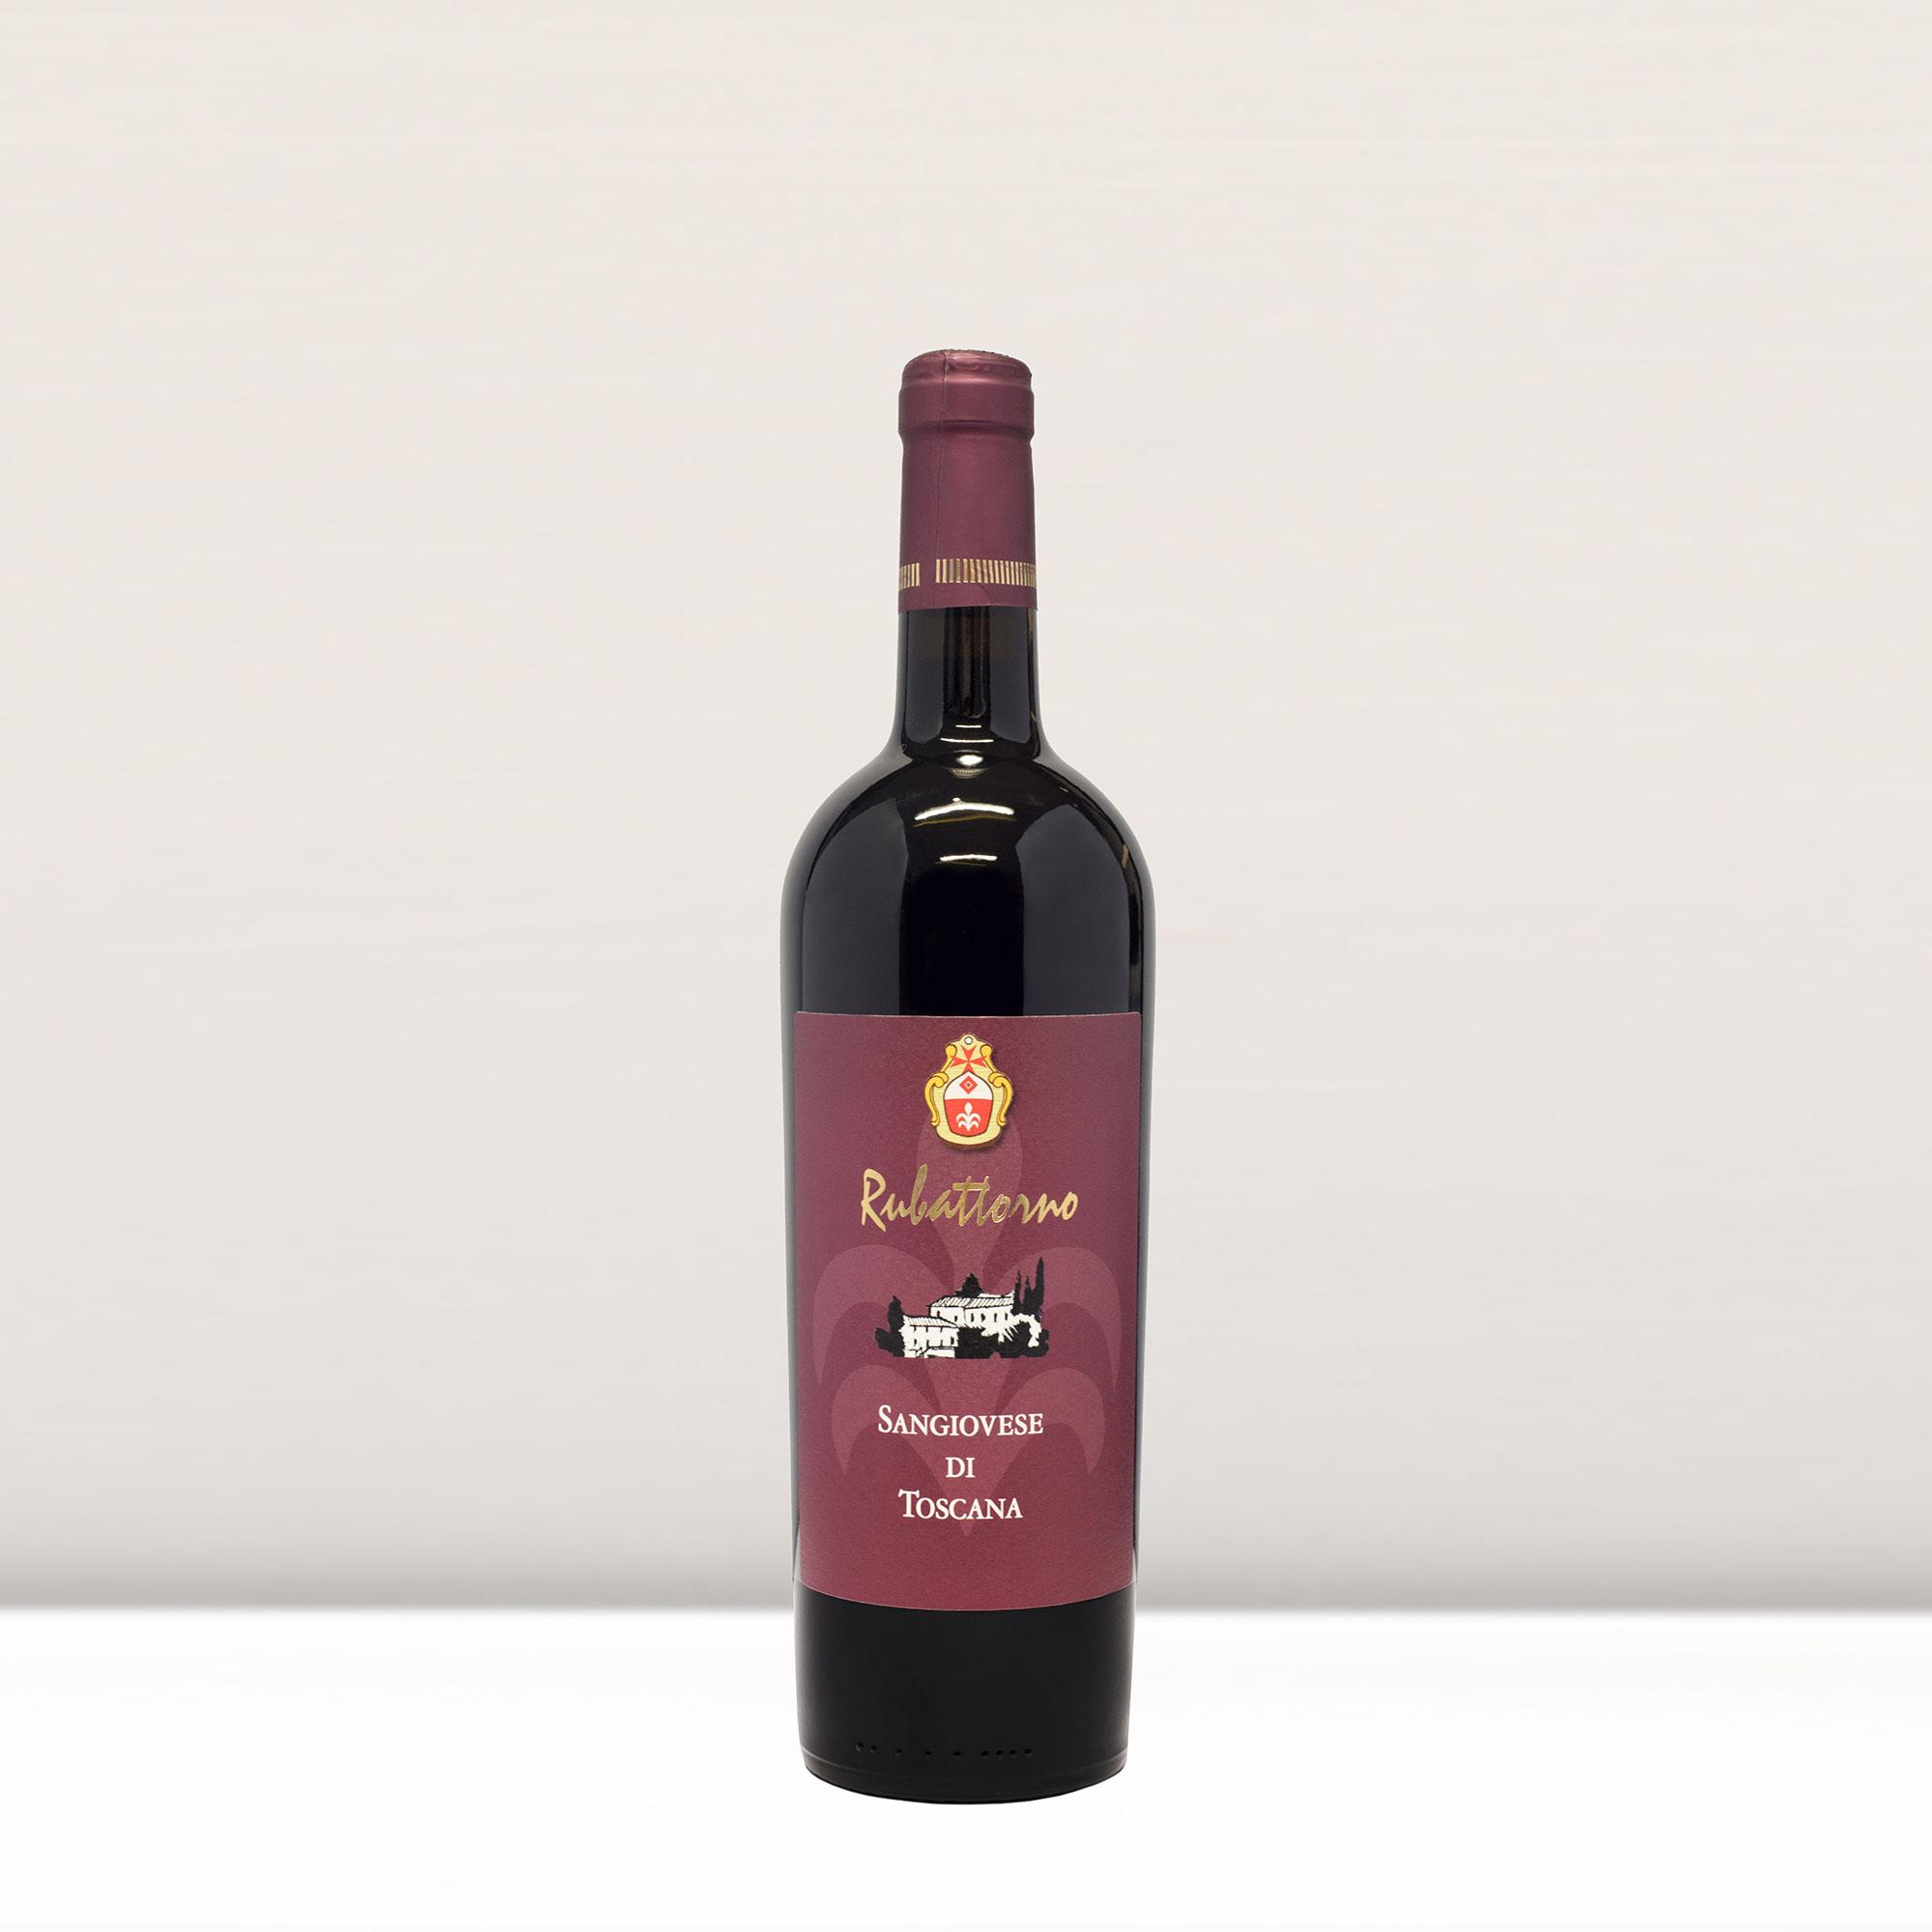 Sangiovese di Toscana I.G.T.